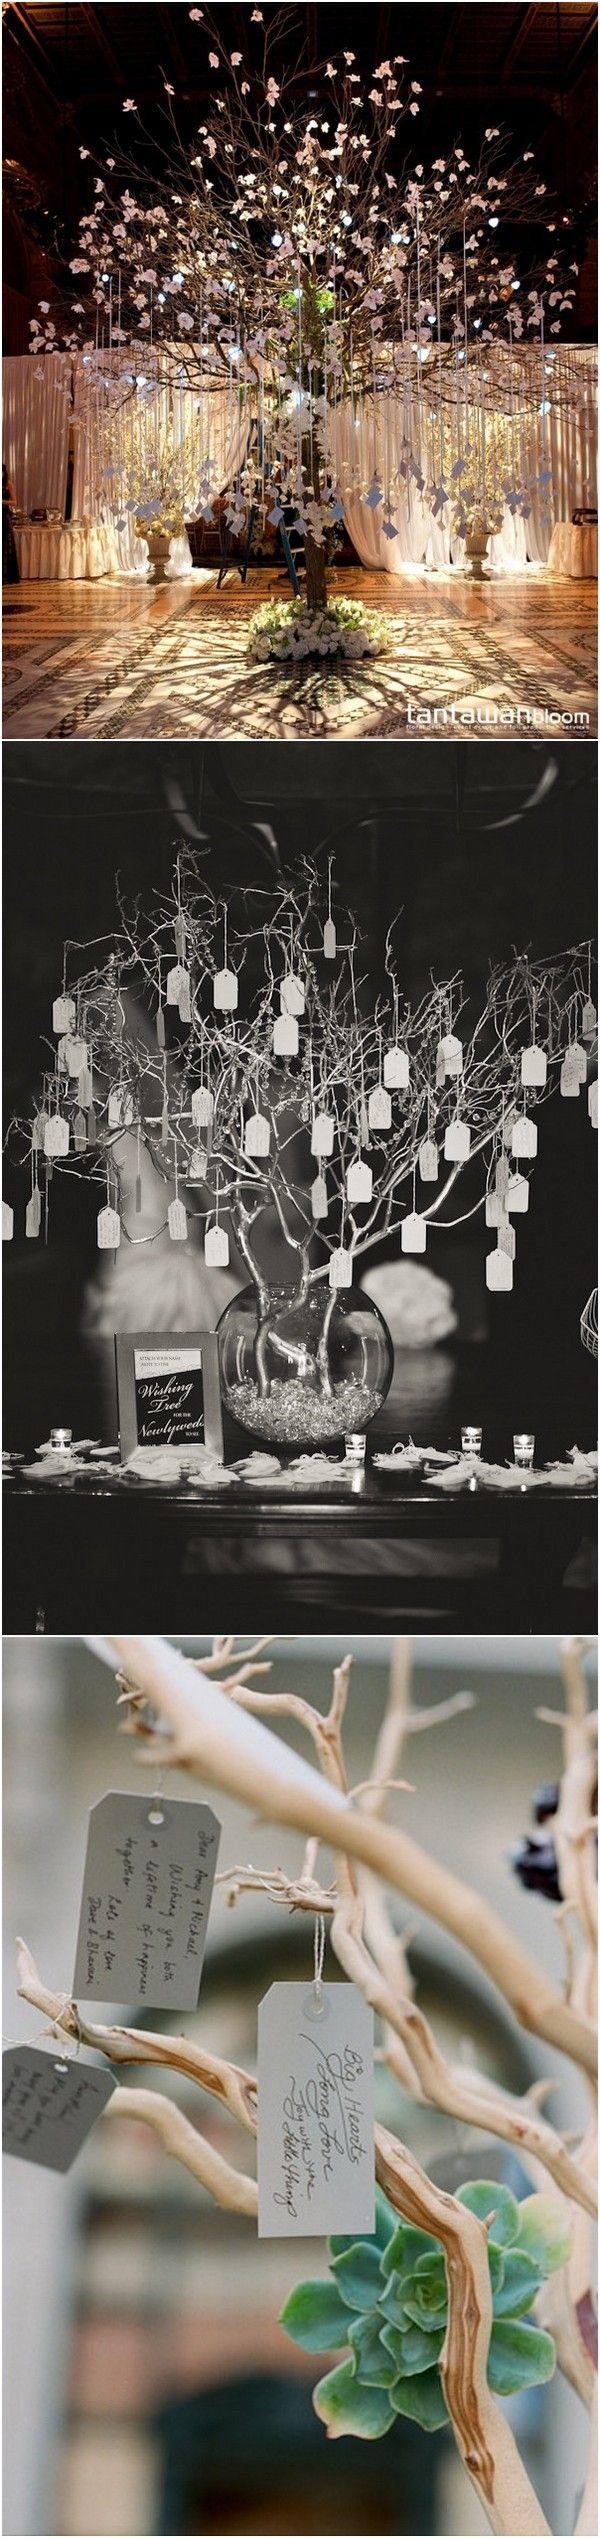 wedding wishing tree decoration ideas